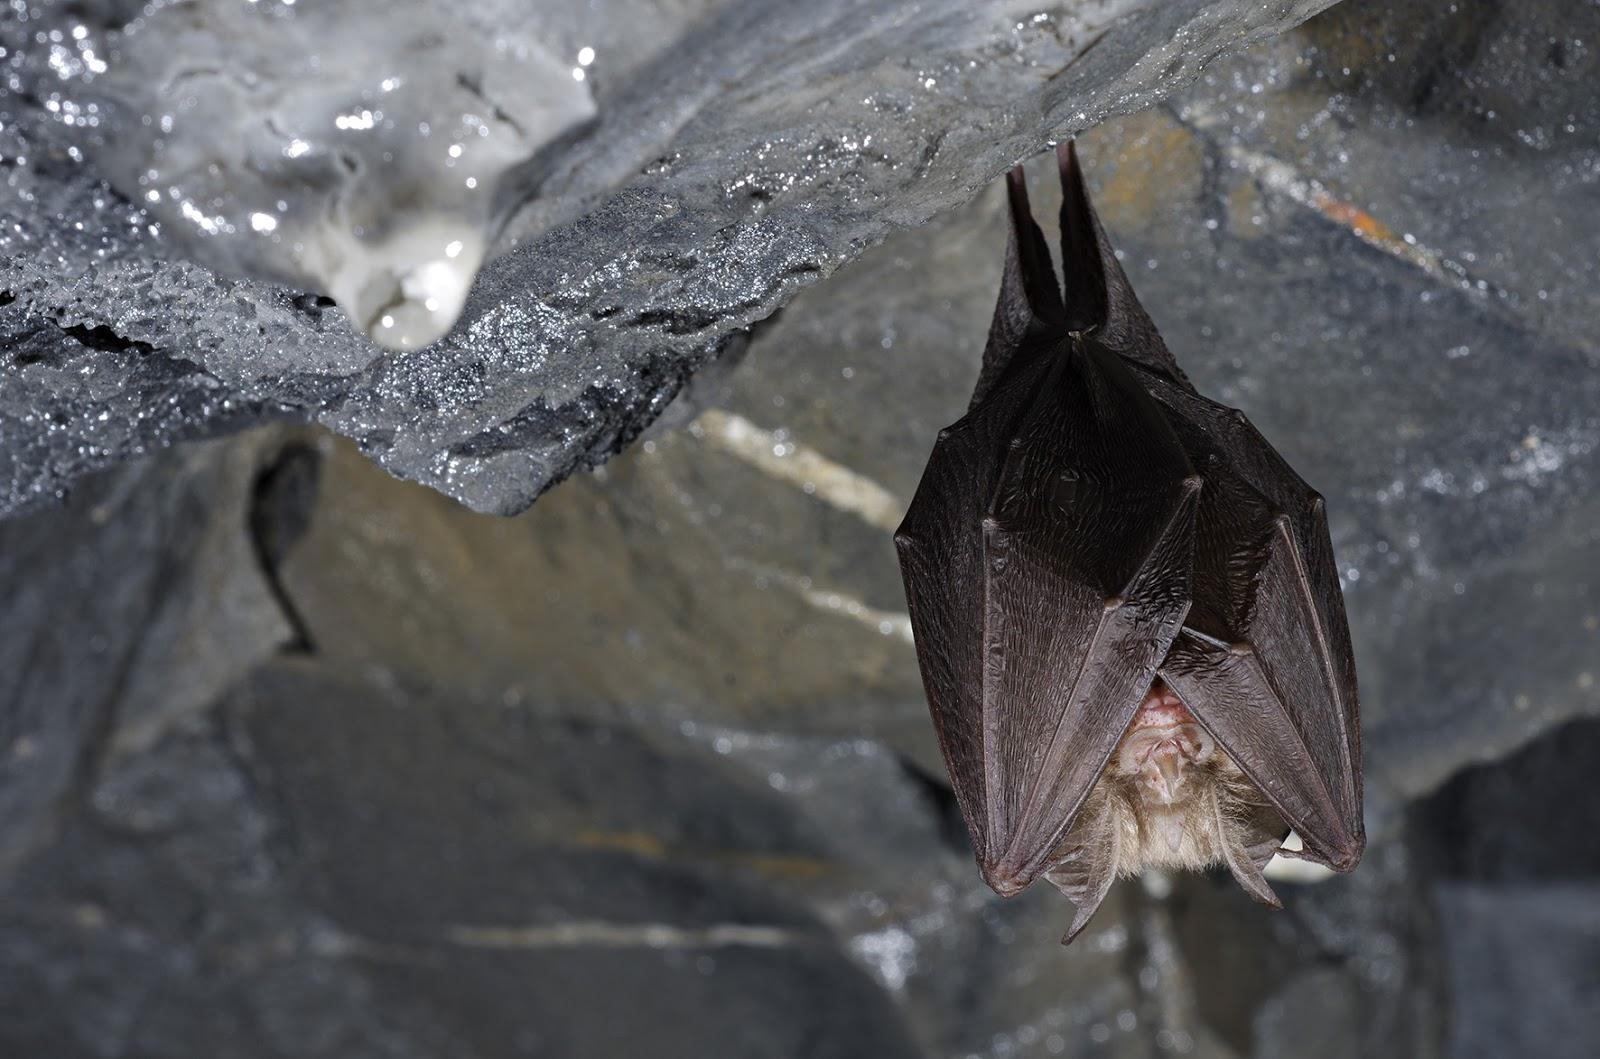 Murciélago de herradura pequeño Marco Maggesi